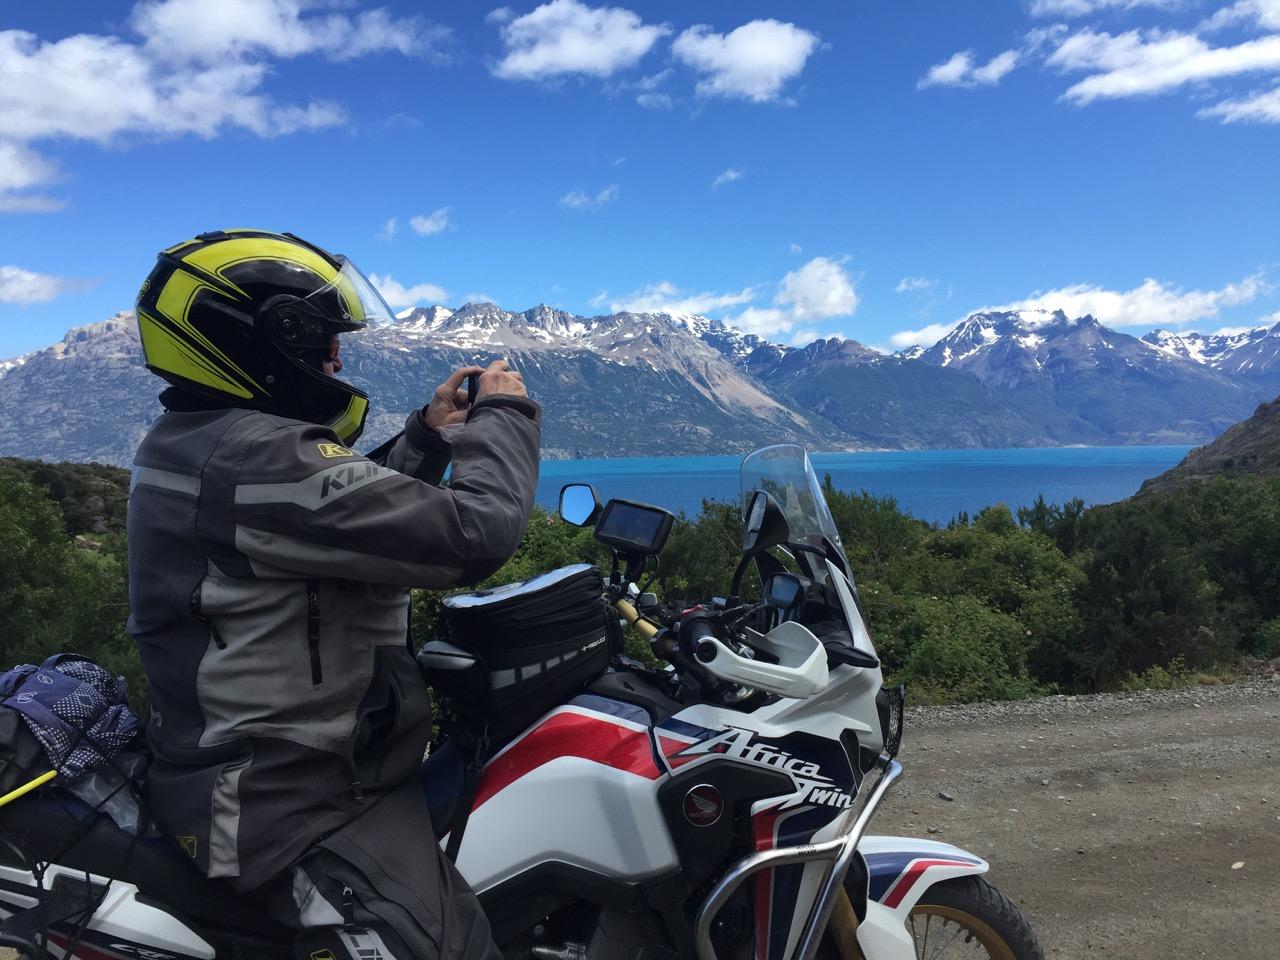 West Coast USA Motorcycle Rentals